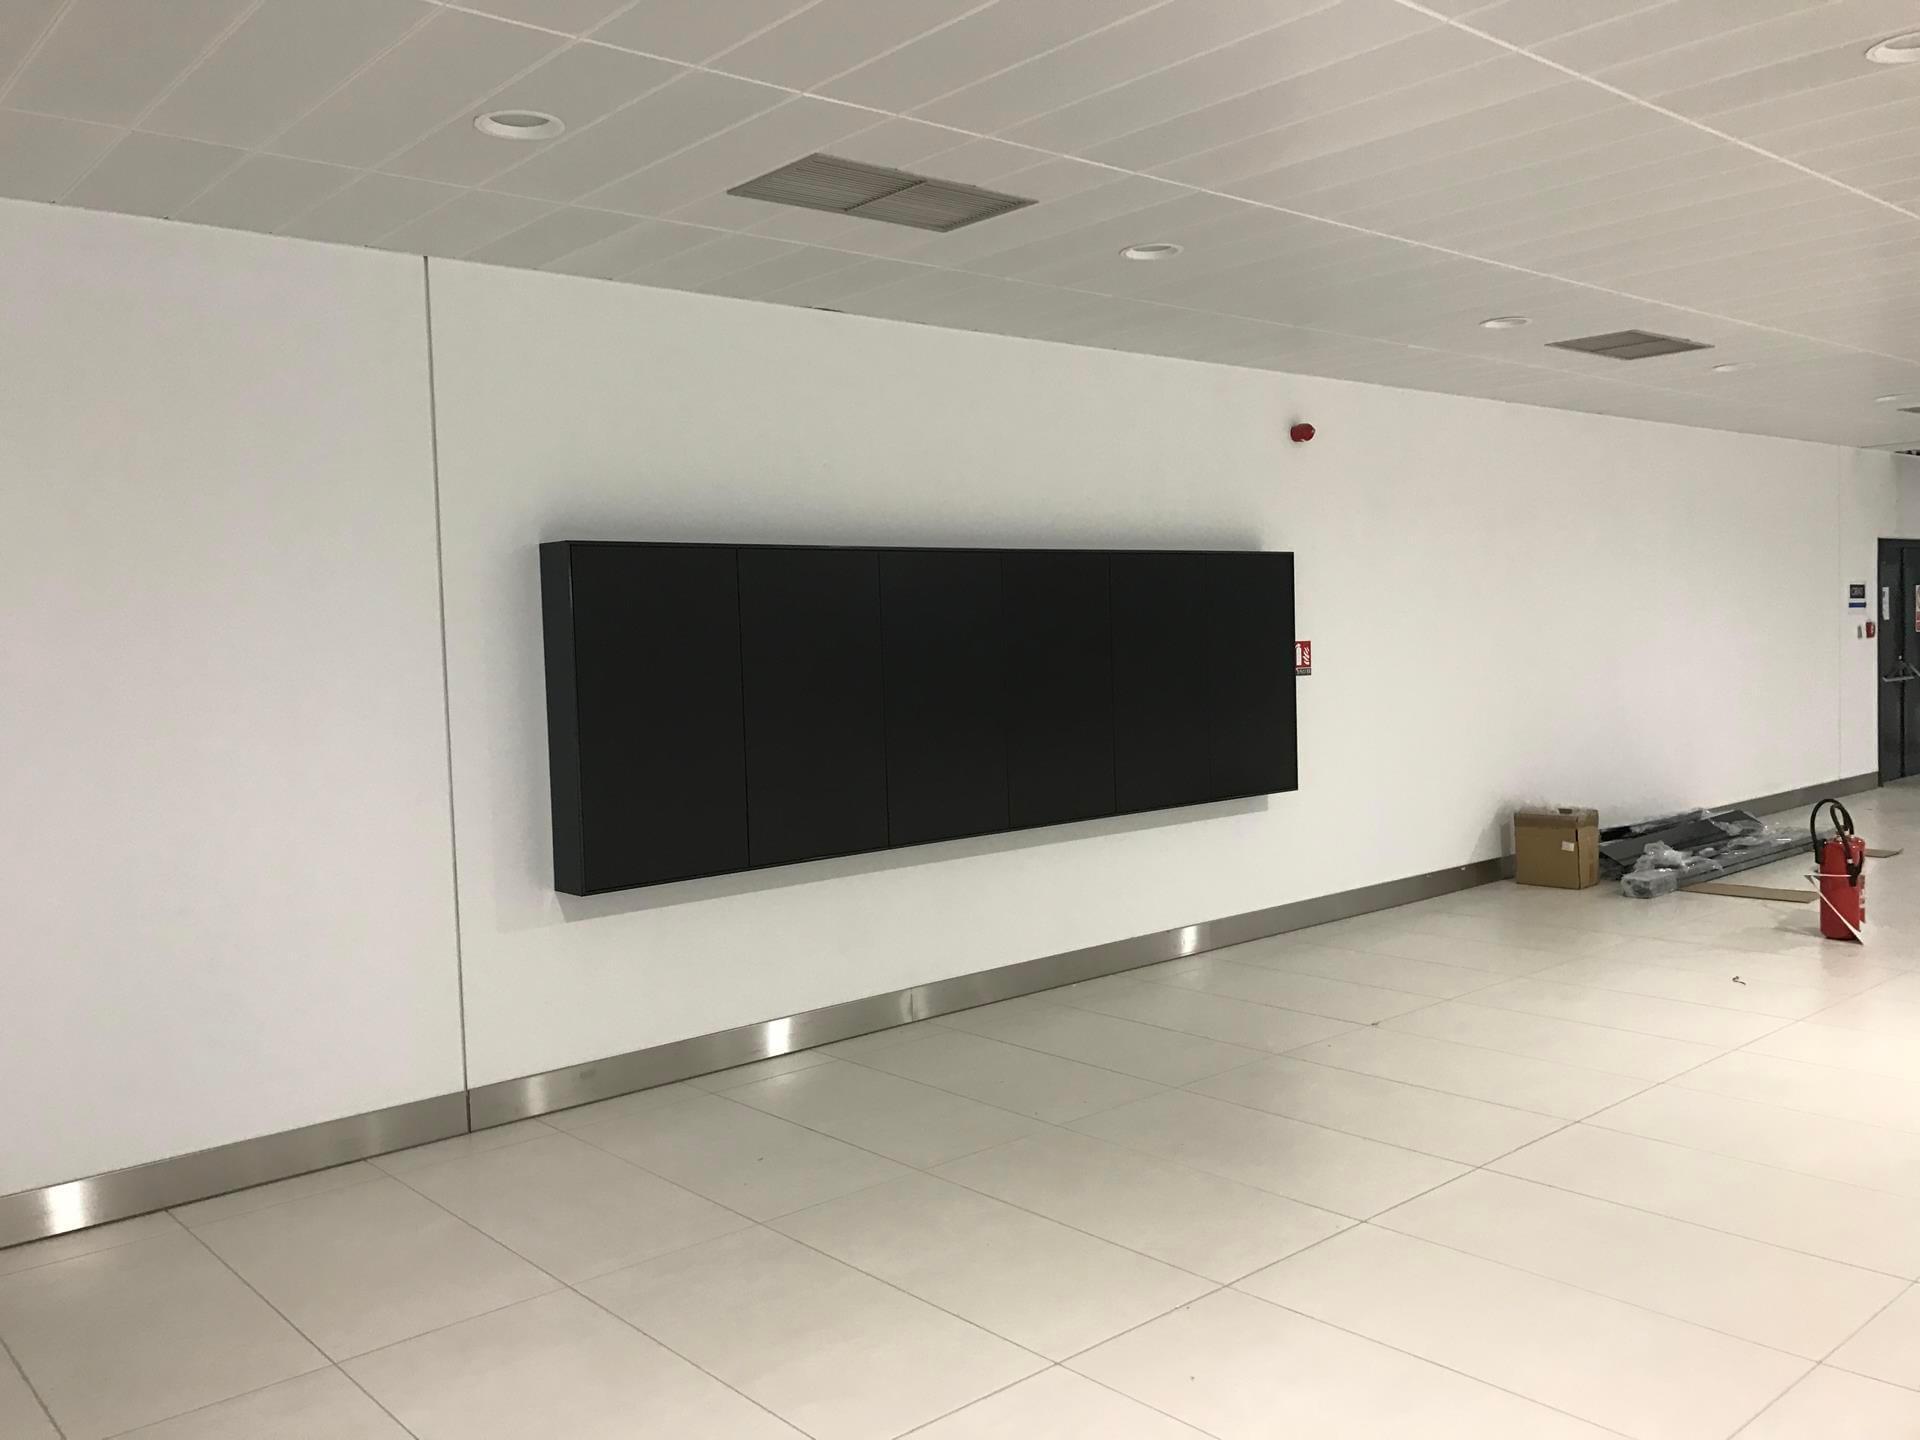 Izrada LED displaya